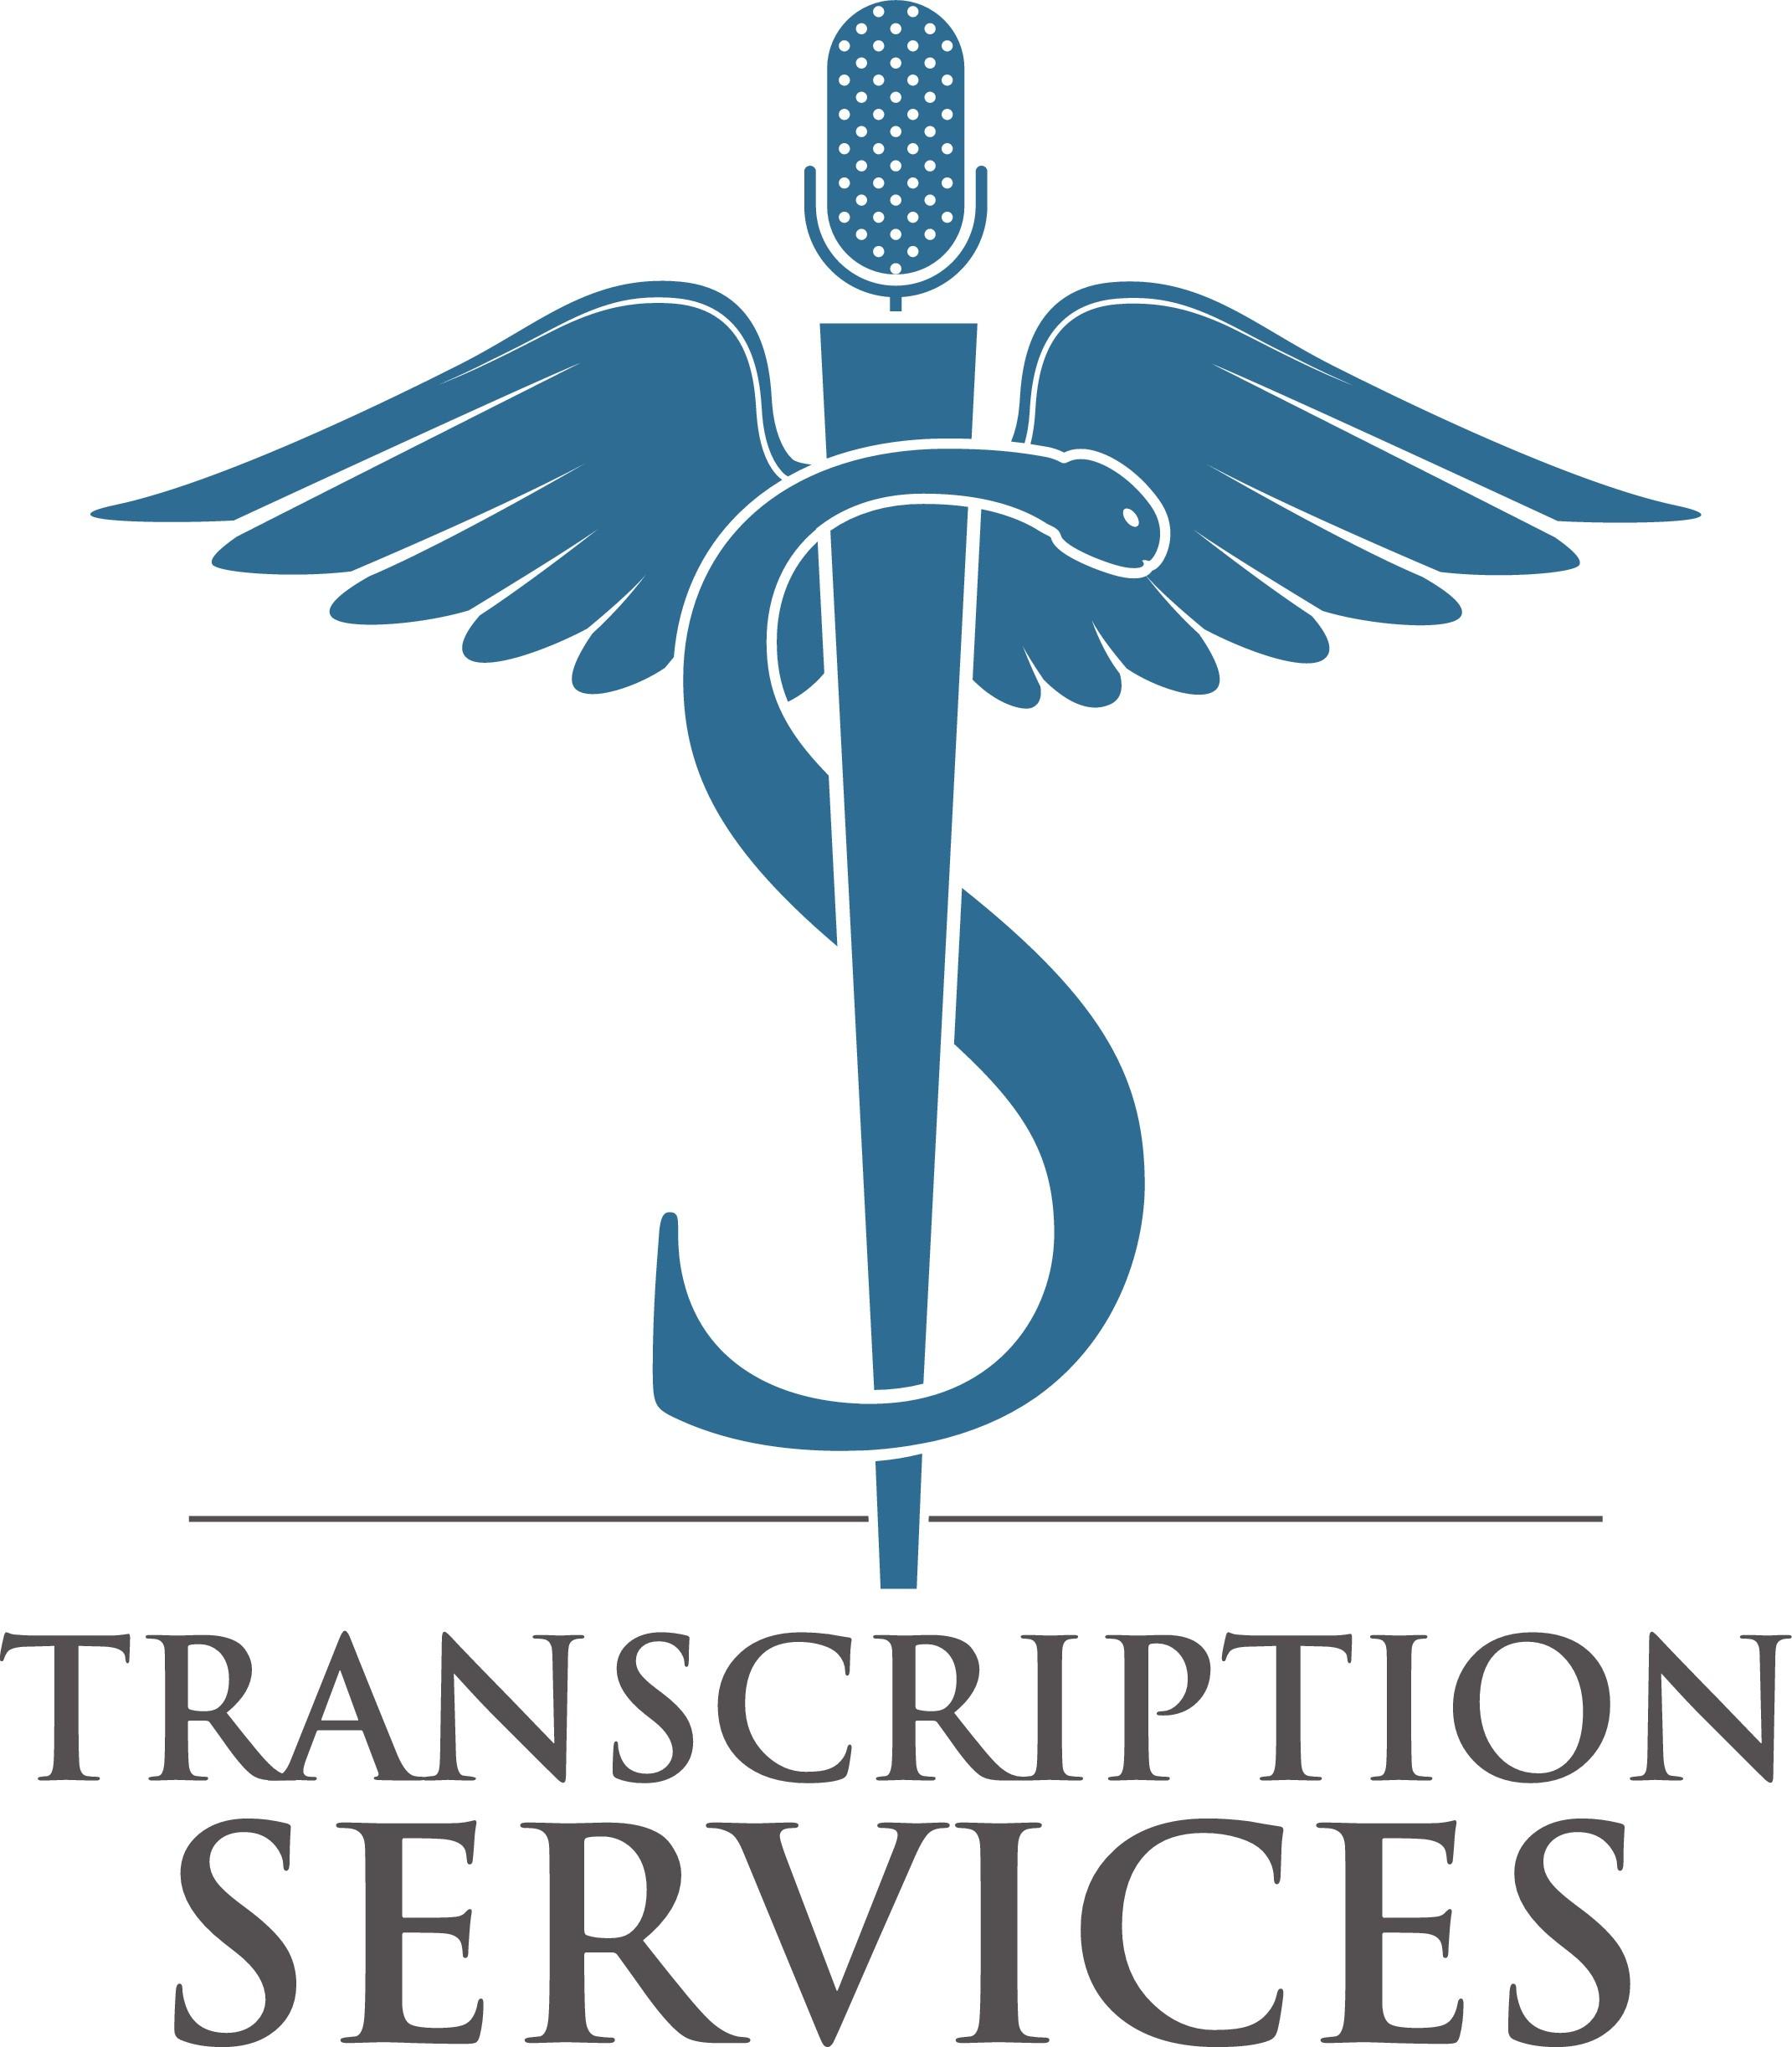 Transcription Services logo